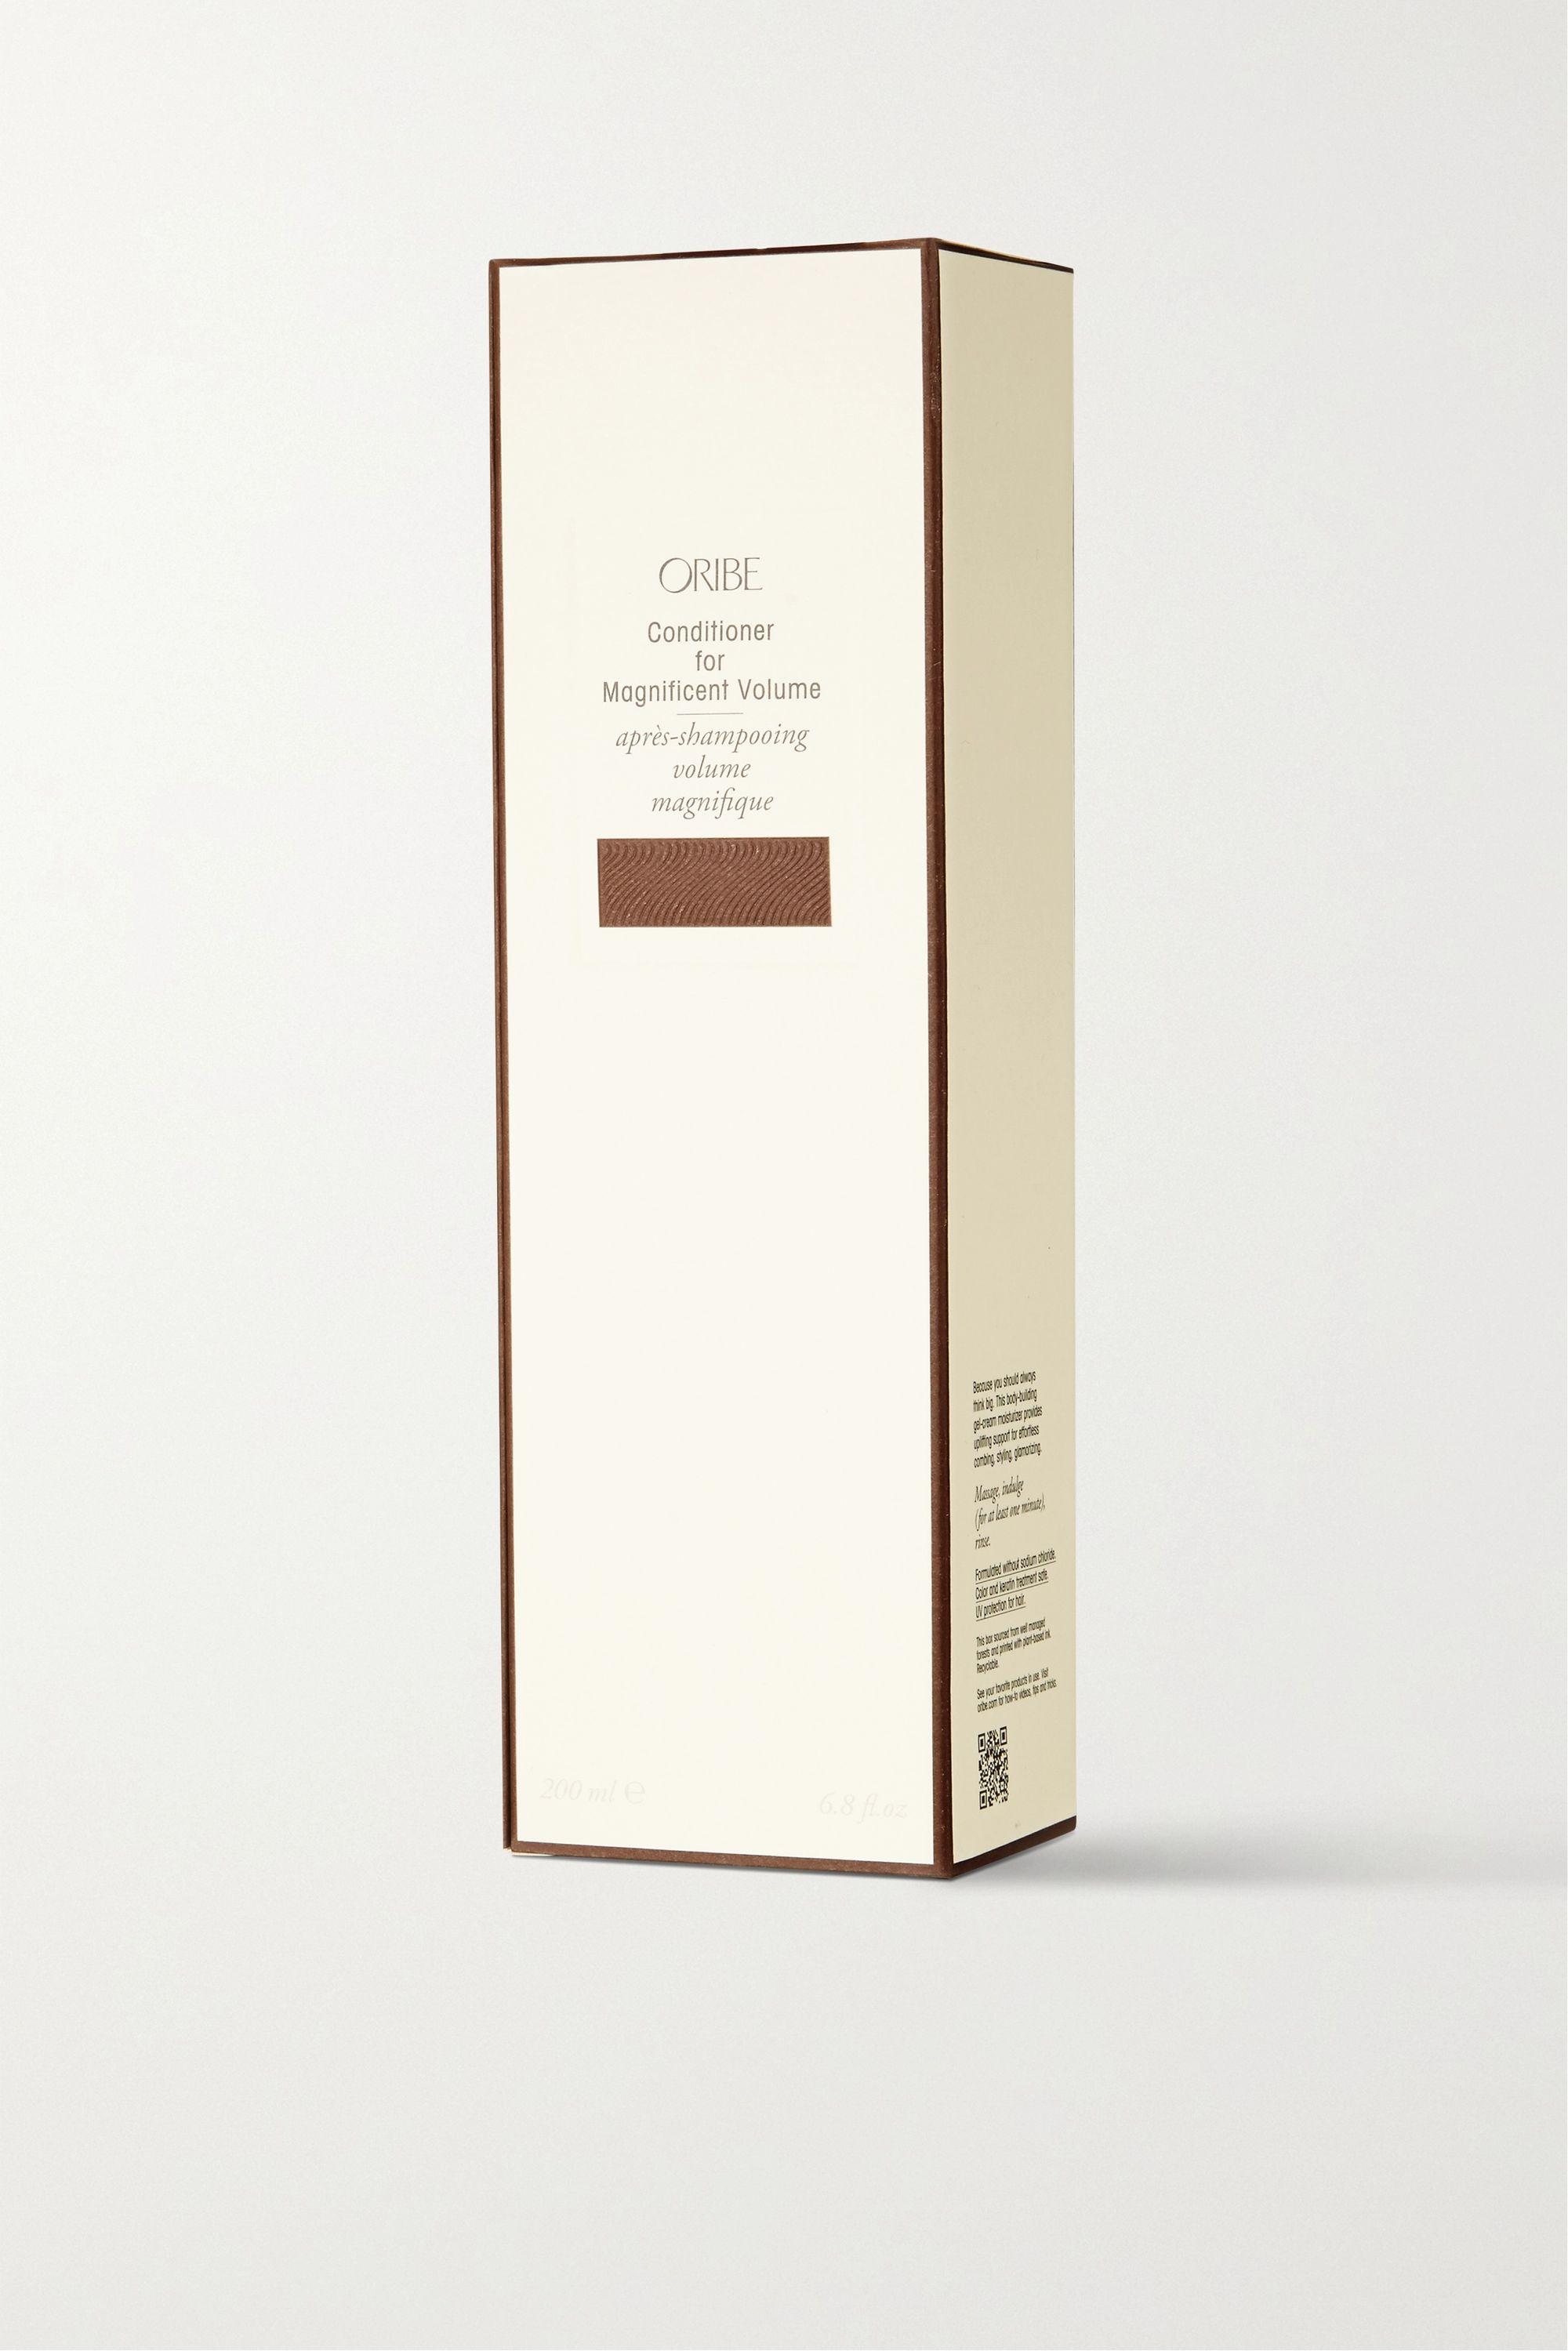 Oribe Conditioner for Magnificent Volume, 200ml